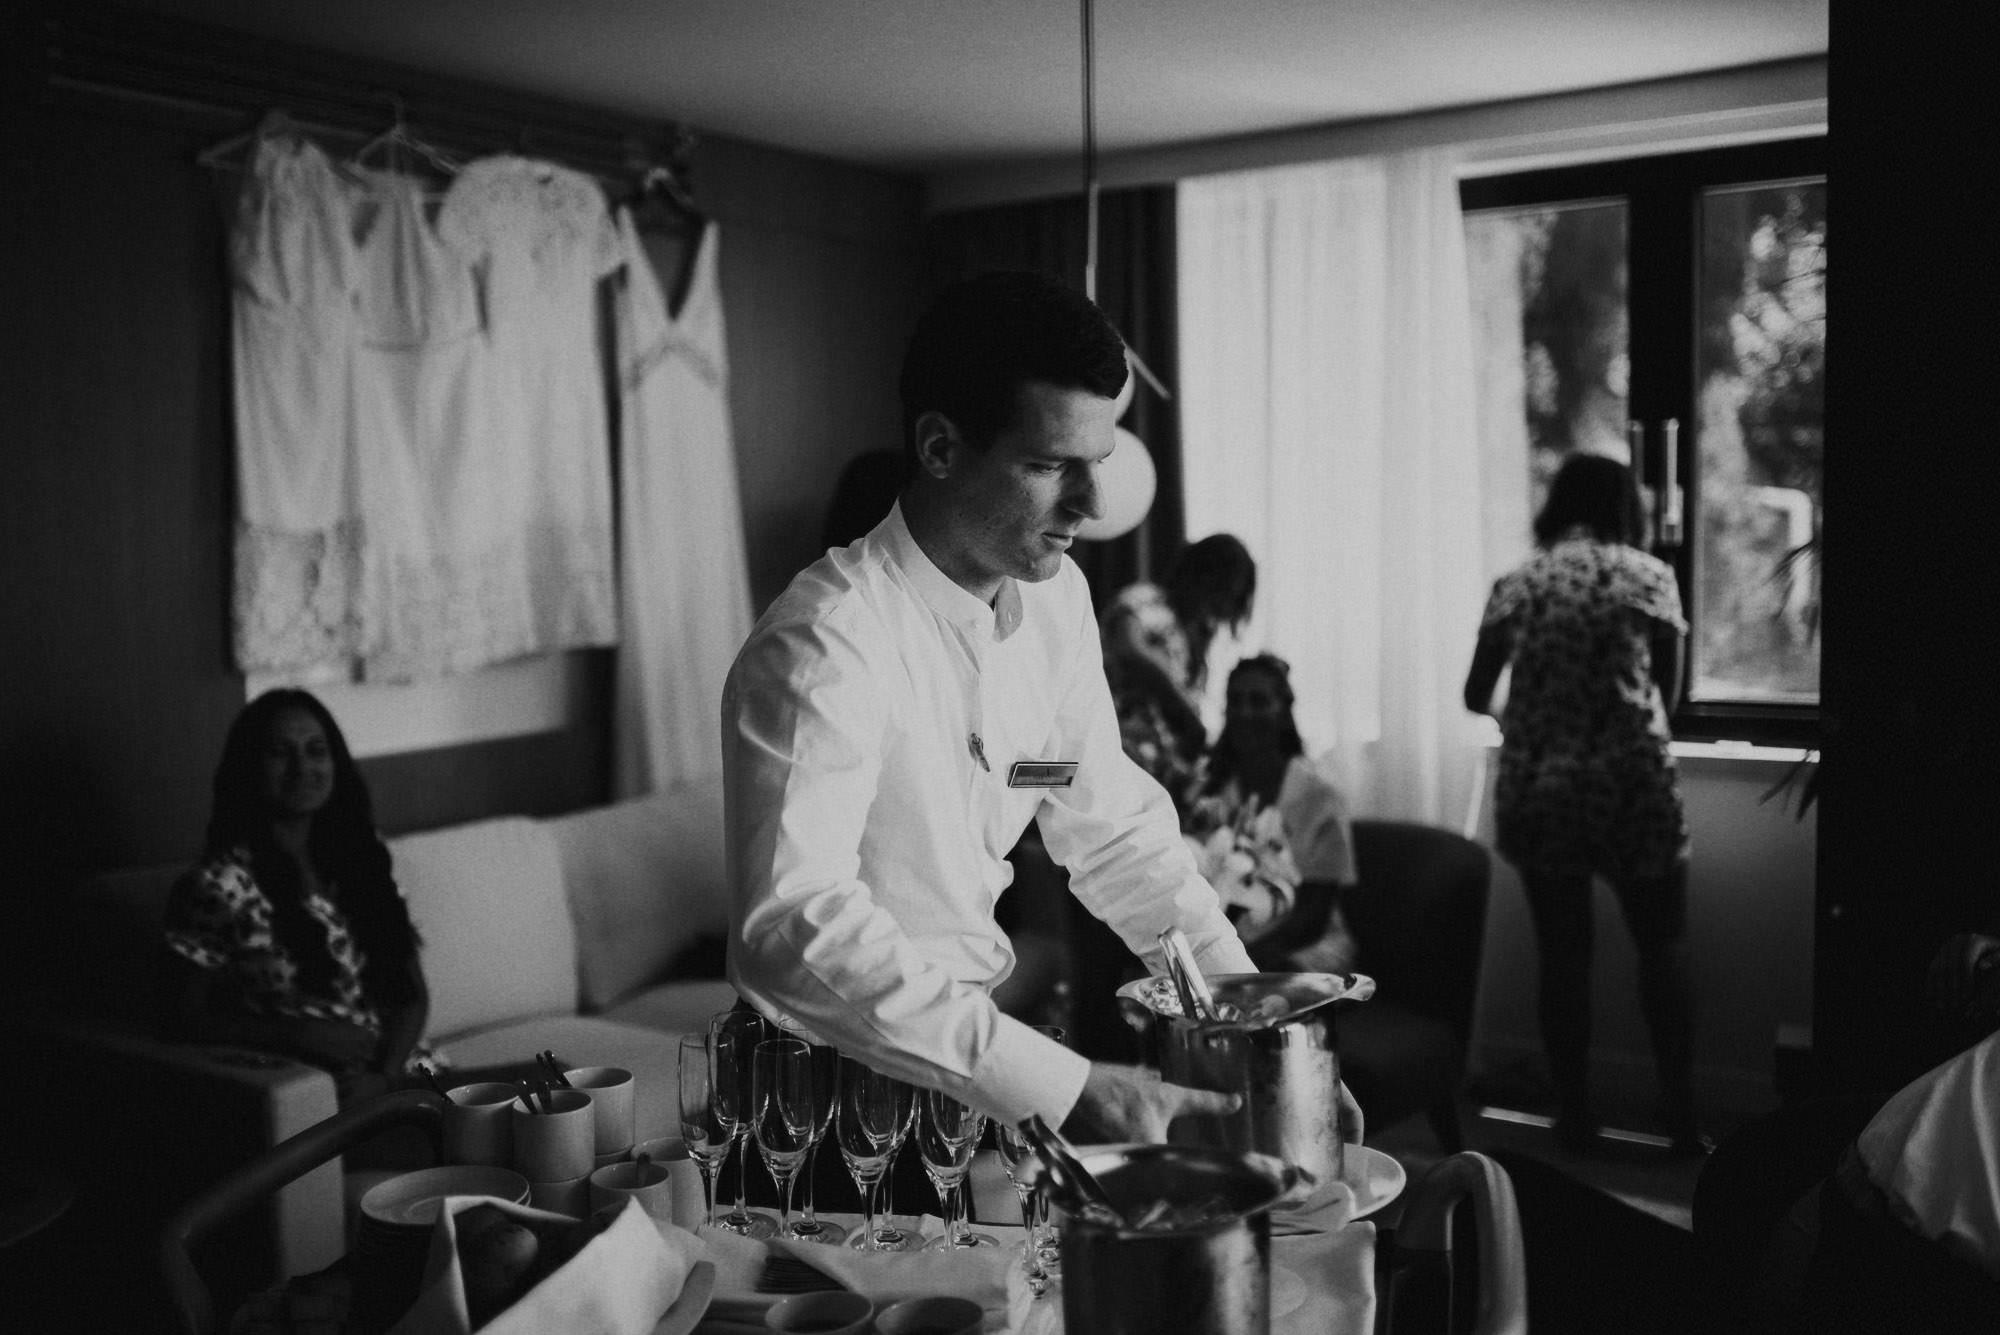 dubrovnik_croatia_wedding_photographer-jere_satamo-destination_weddings-031-web.jpg